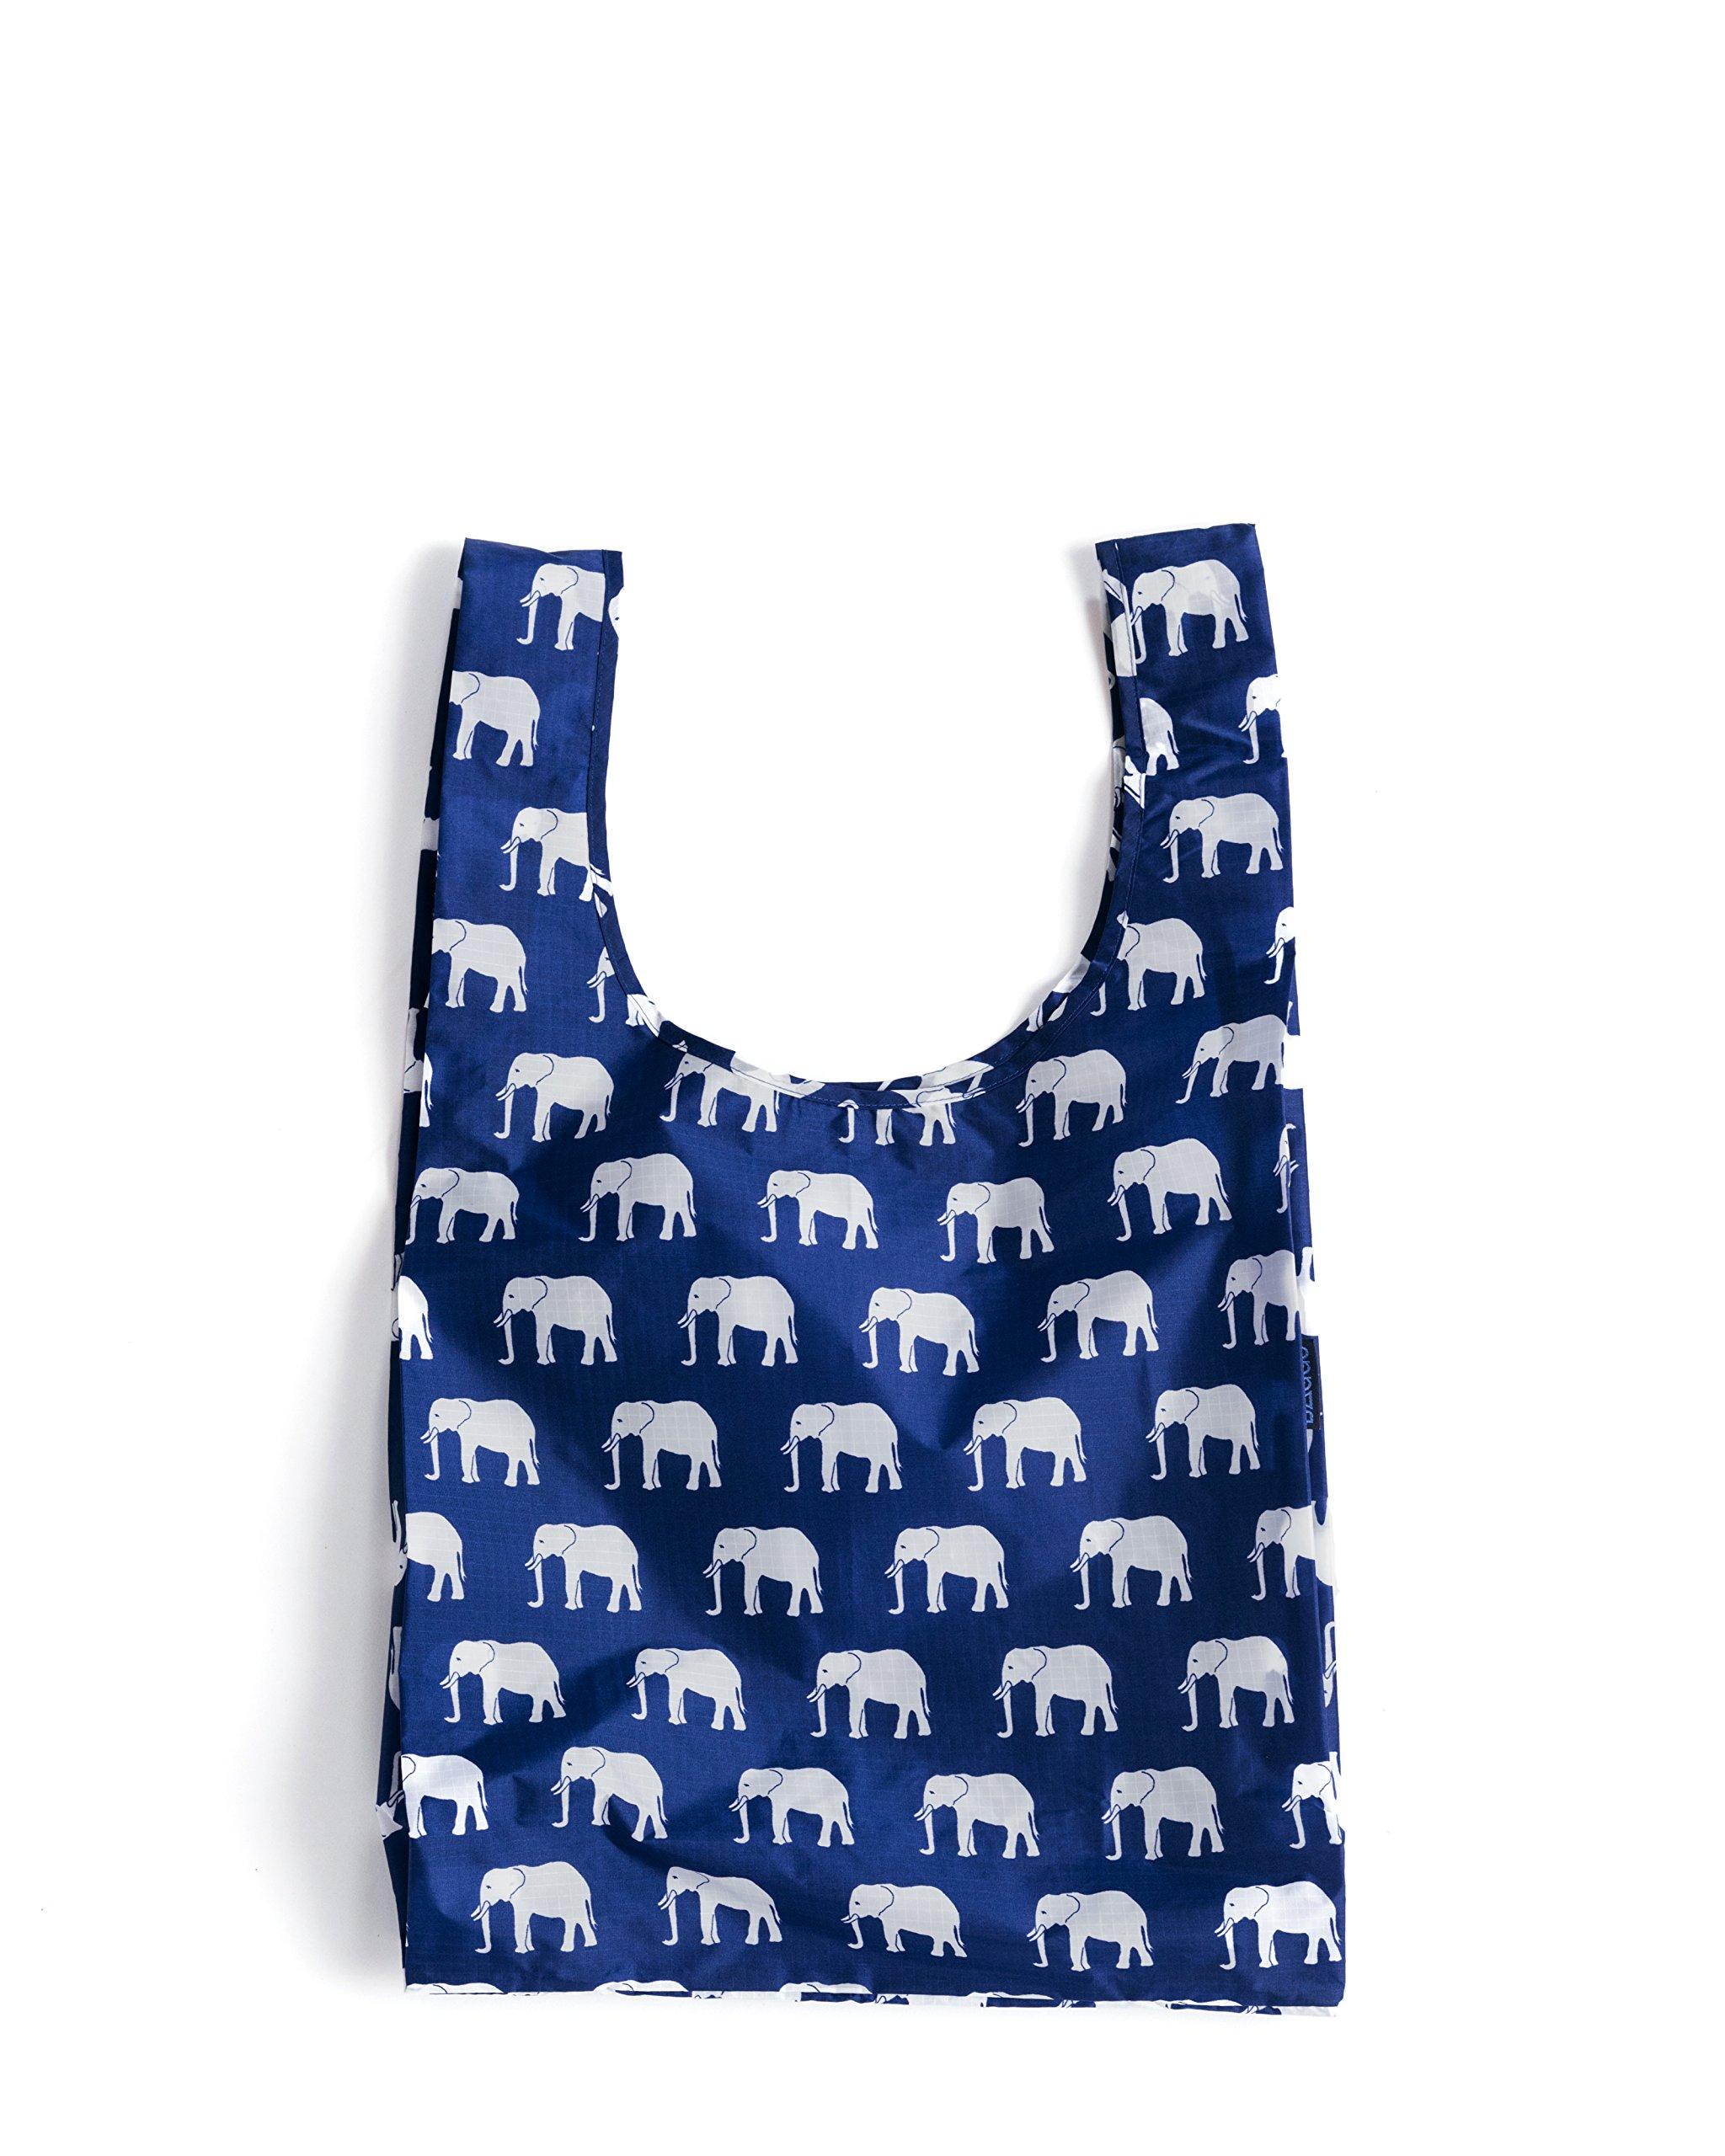 BAGGU Standard Reusable Shopping Bag, Eco-friendly Ripstop Nylon Foldable Grocery Tote, Elephant Blue (2018)